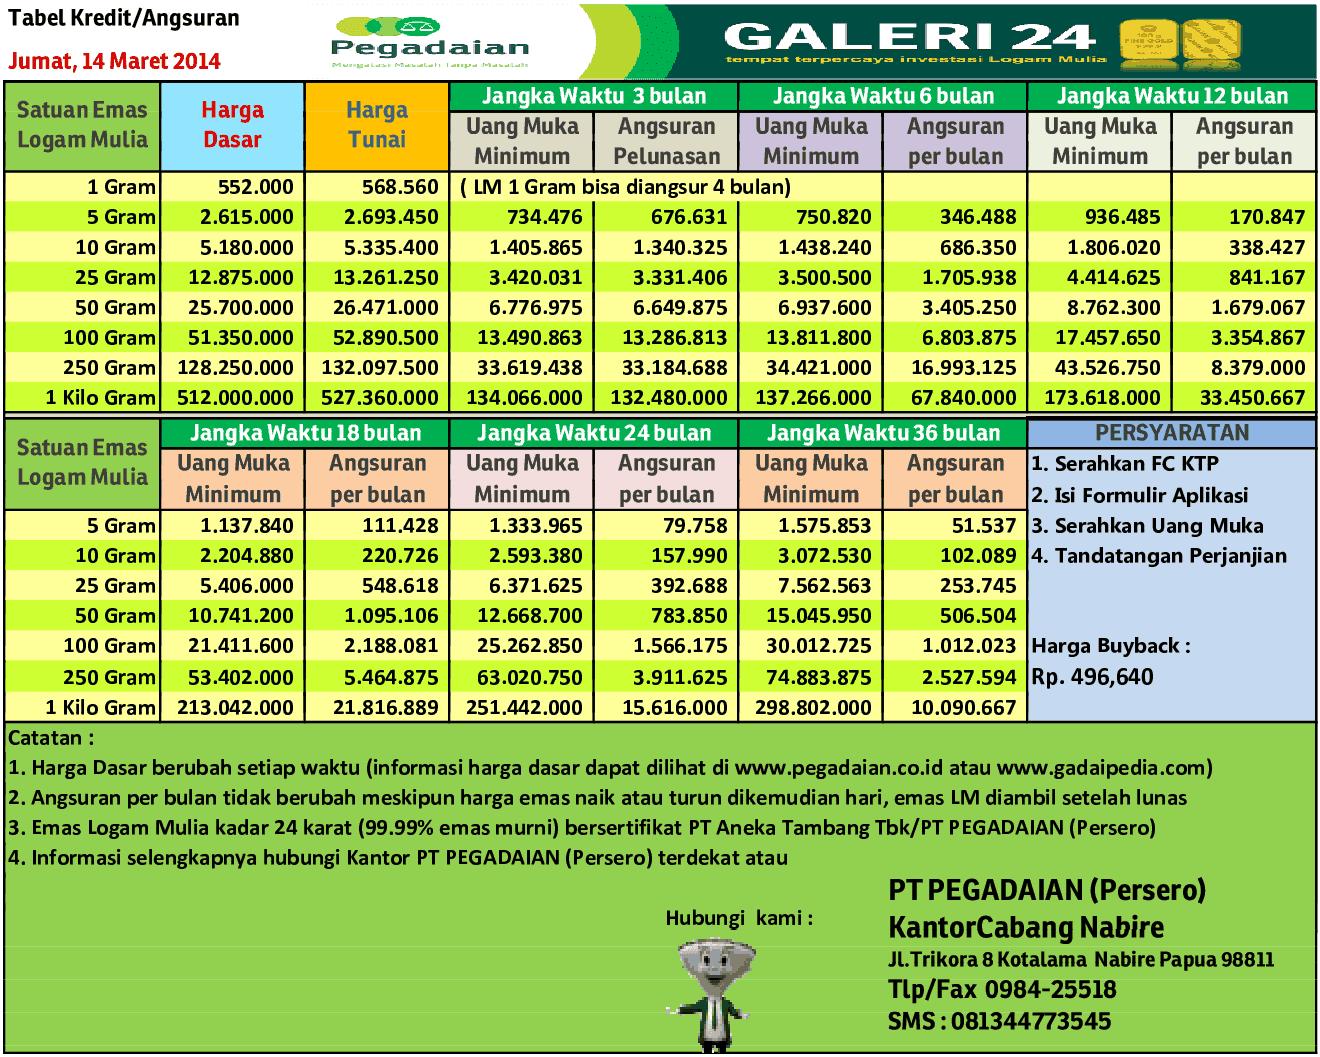 Seputar Pegadaian Harga emas dan tabel kredit emas 14